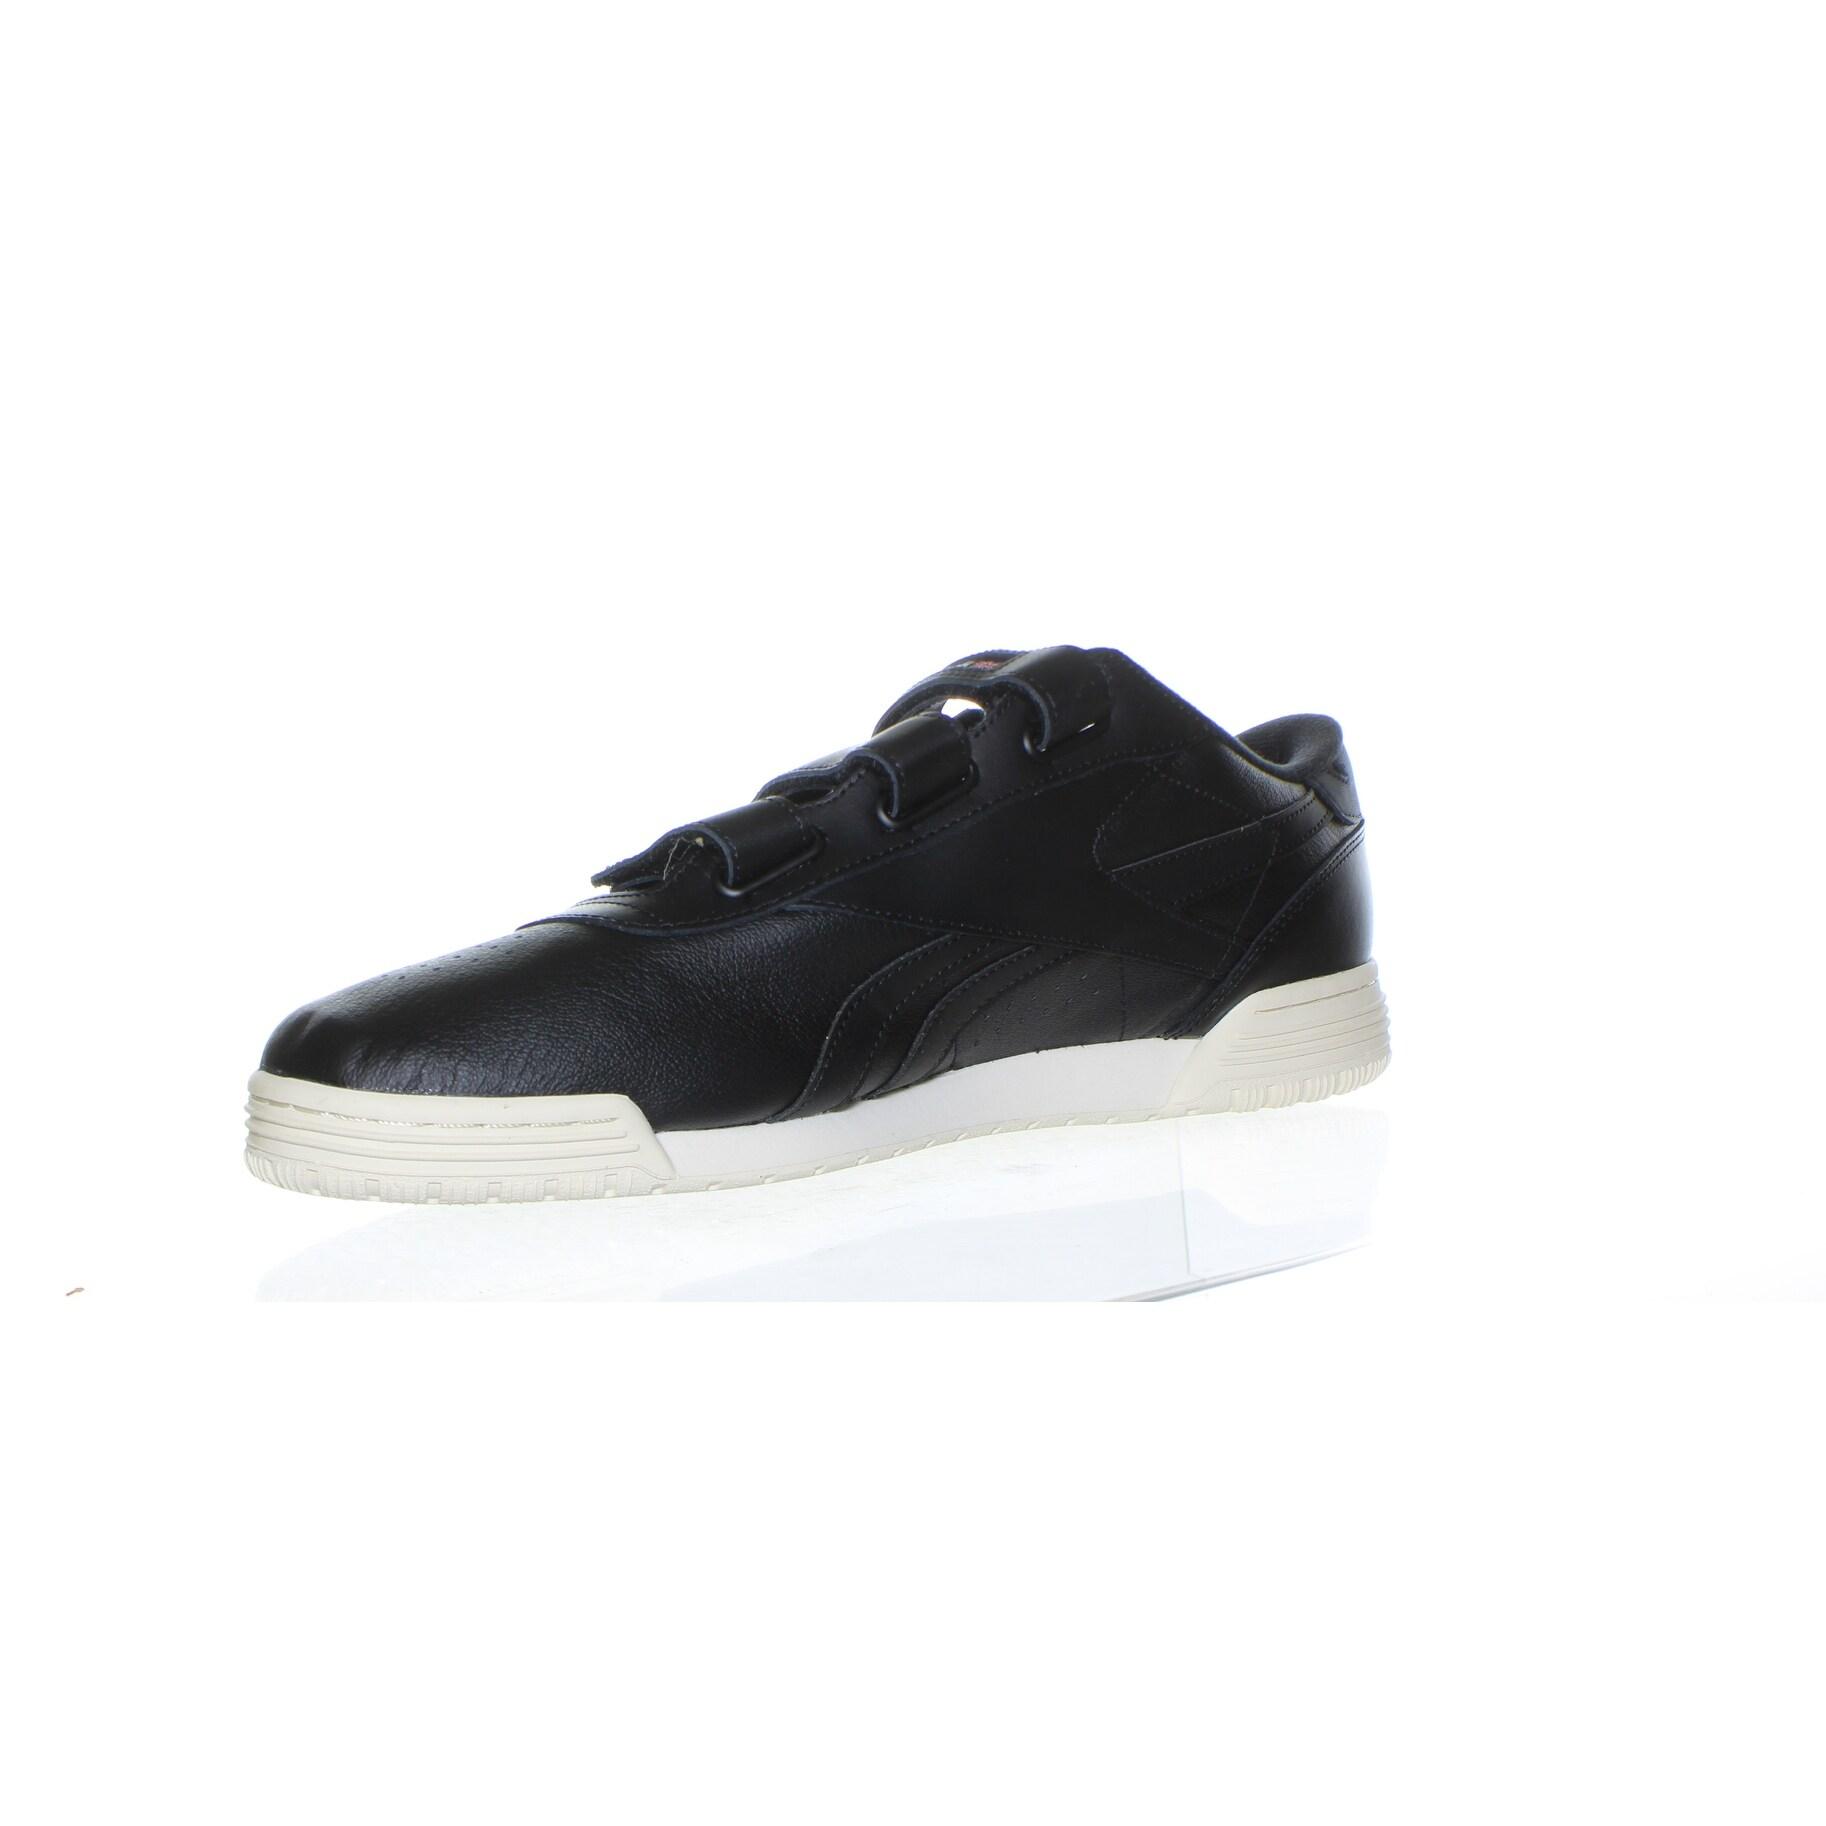 Reebok Men/'s Exofit 600 Shoes